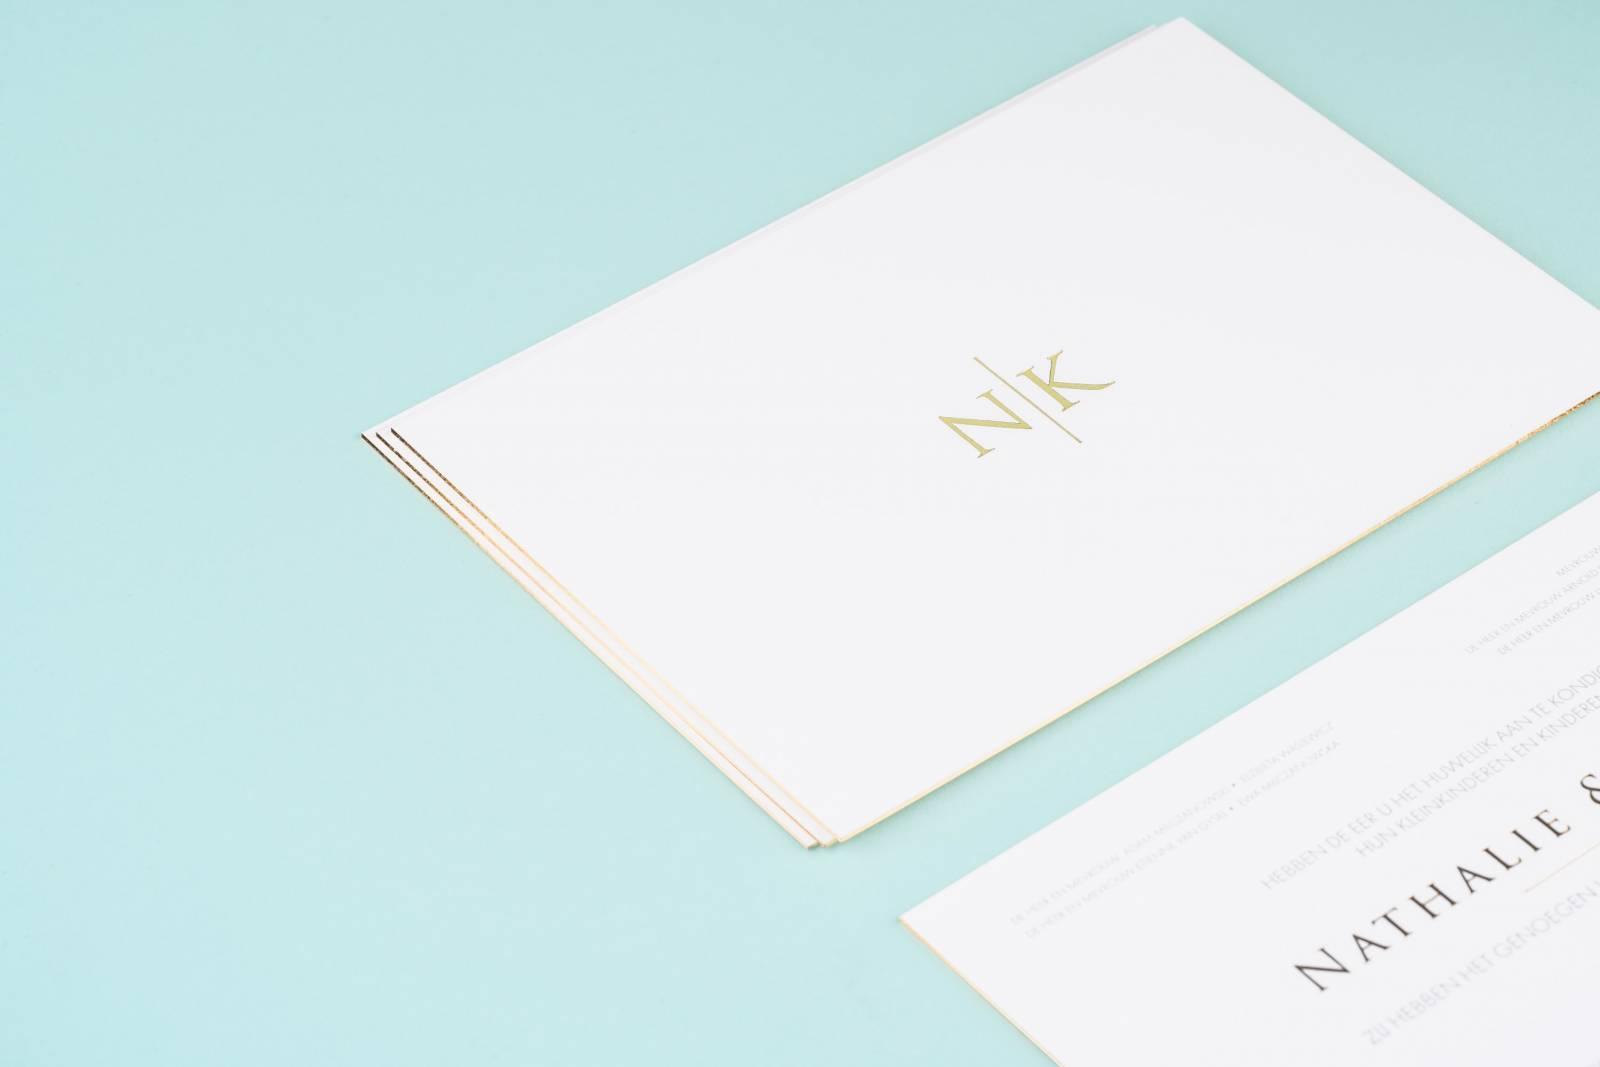 House of Weddings Uitgelijnd Drukwerk Uitnodiging Wedding Stationary Huwelijk Letterpress (7) (Custom)